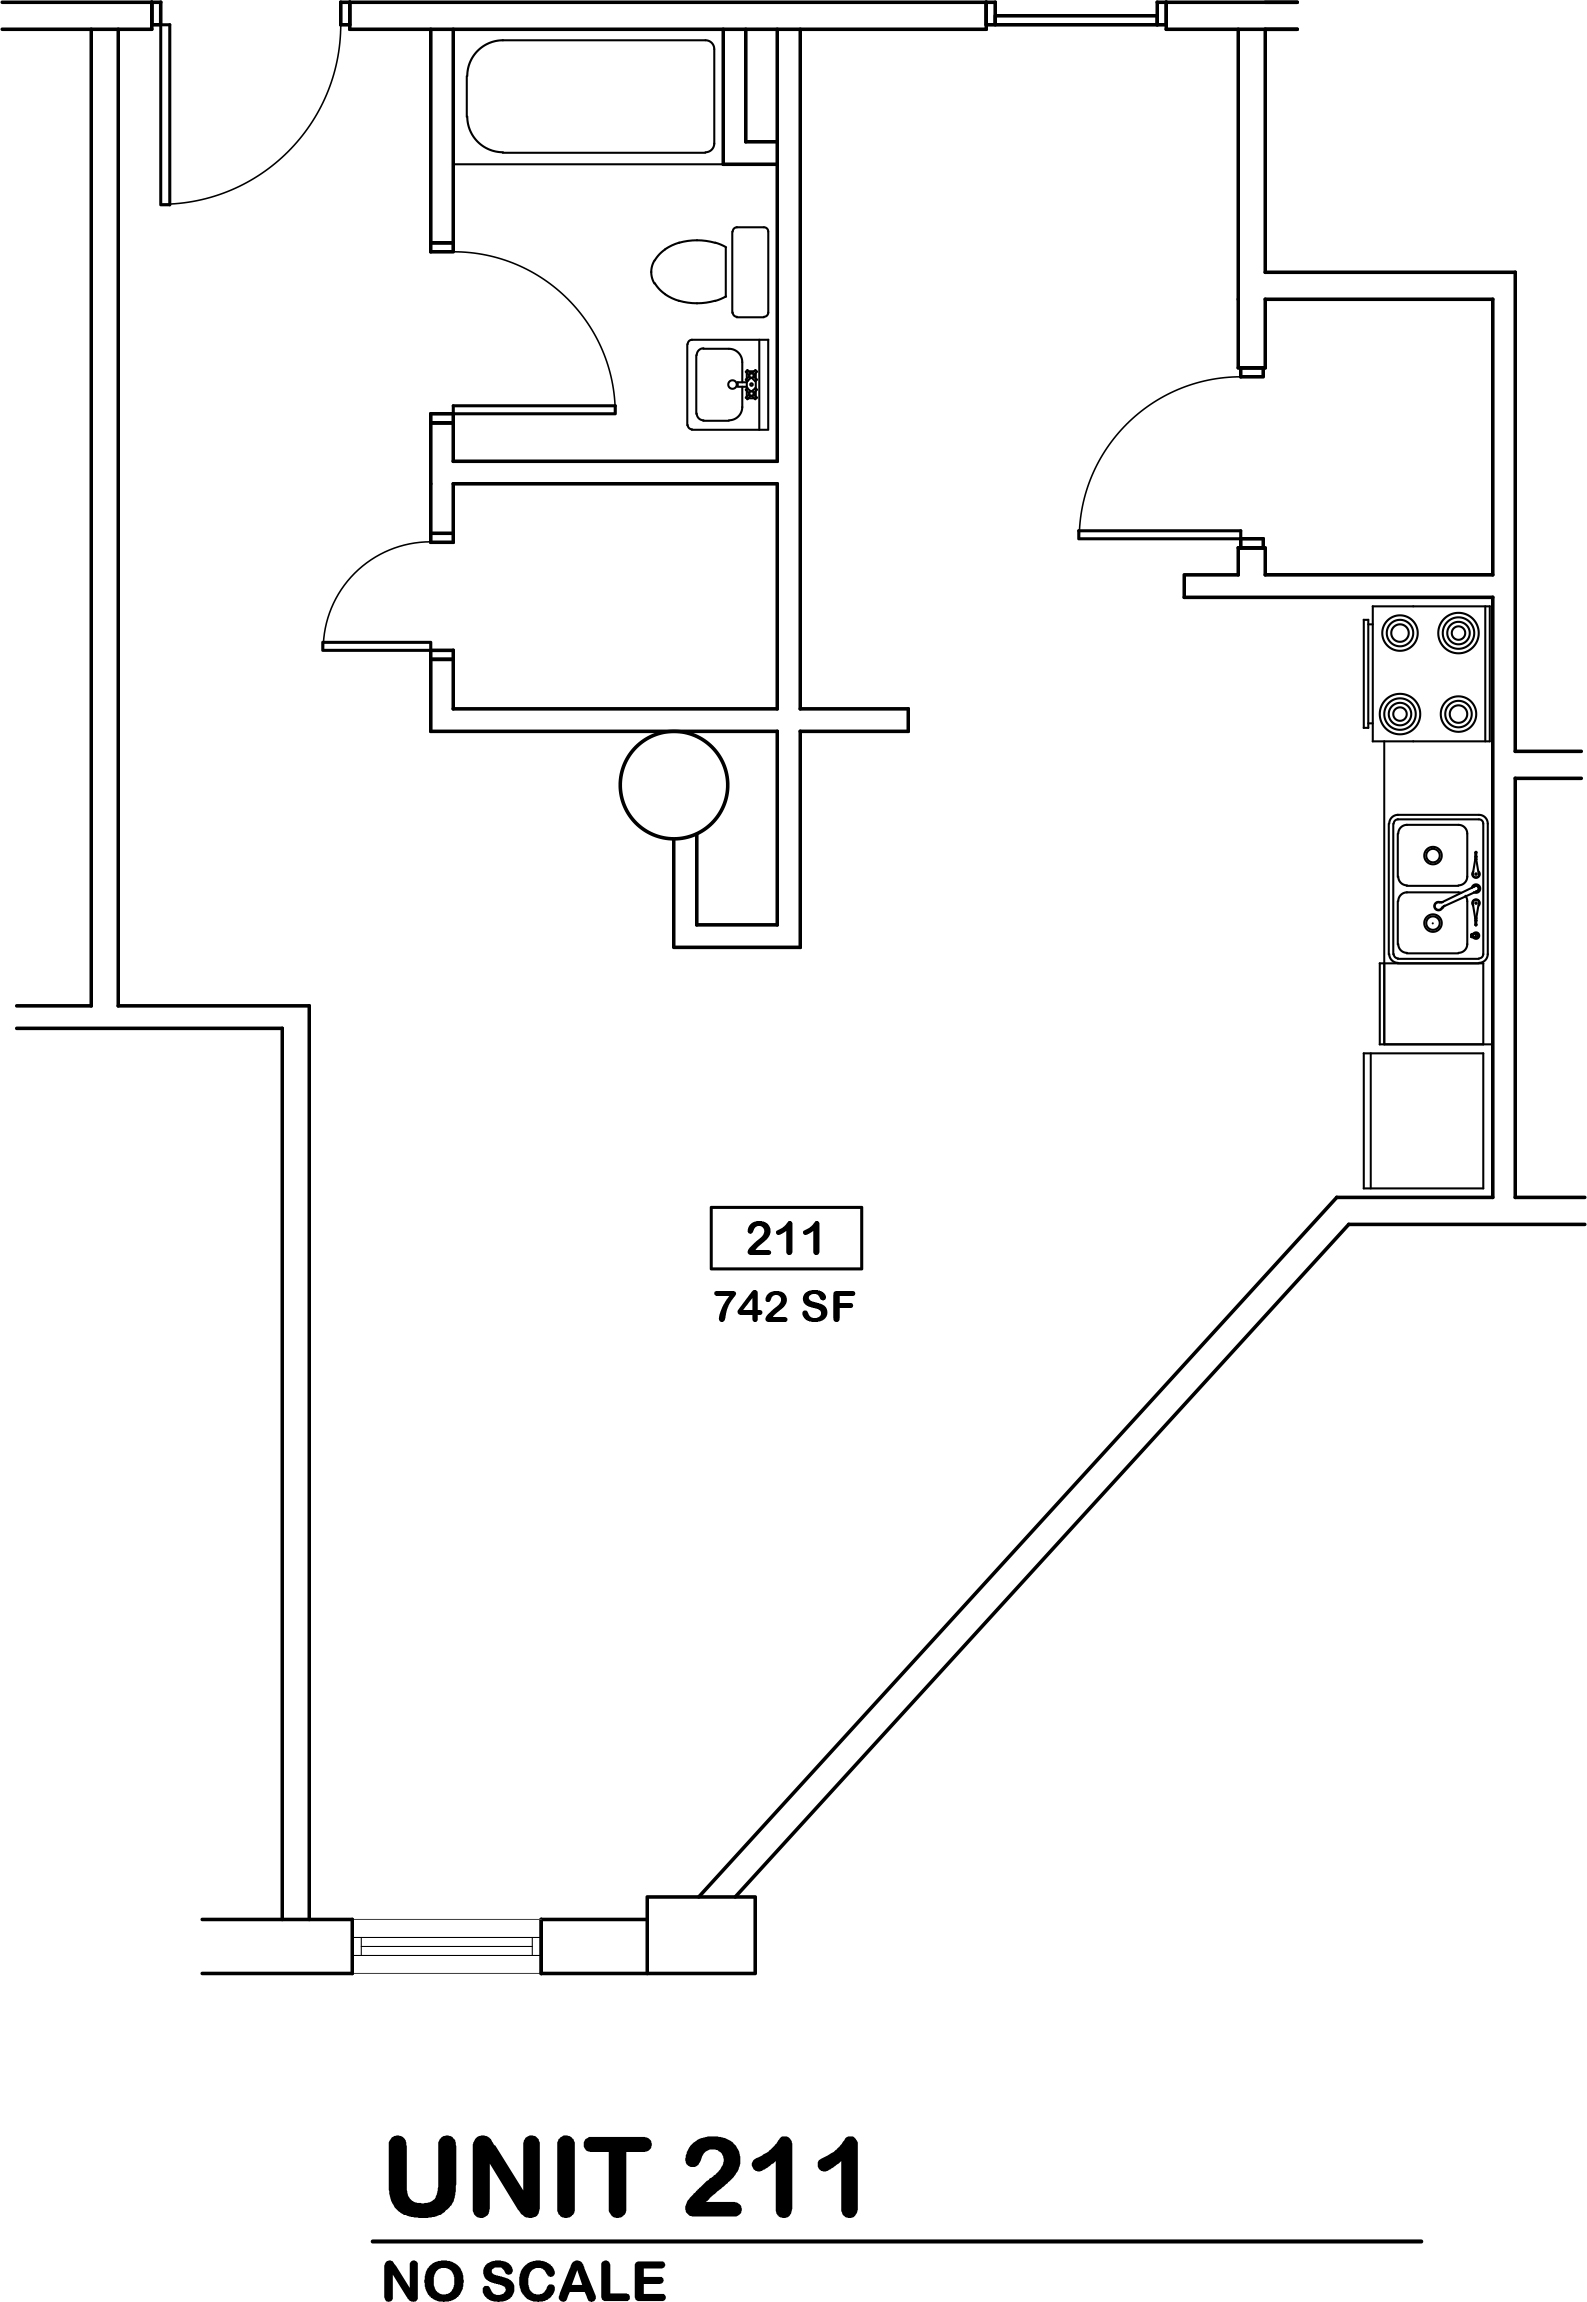 Hybrid Studio / 1 bath   $760 / 742 sq ft